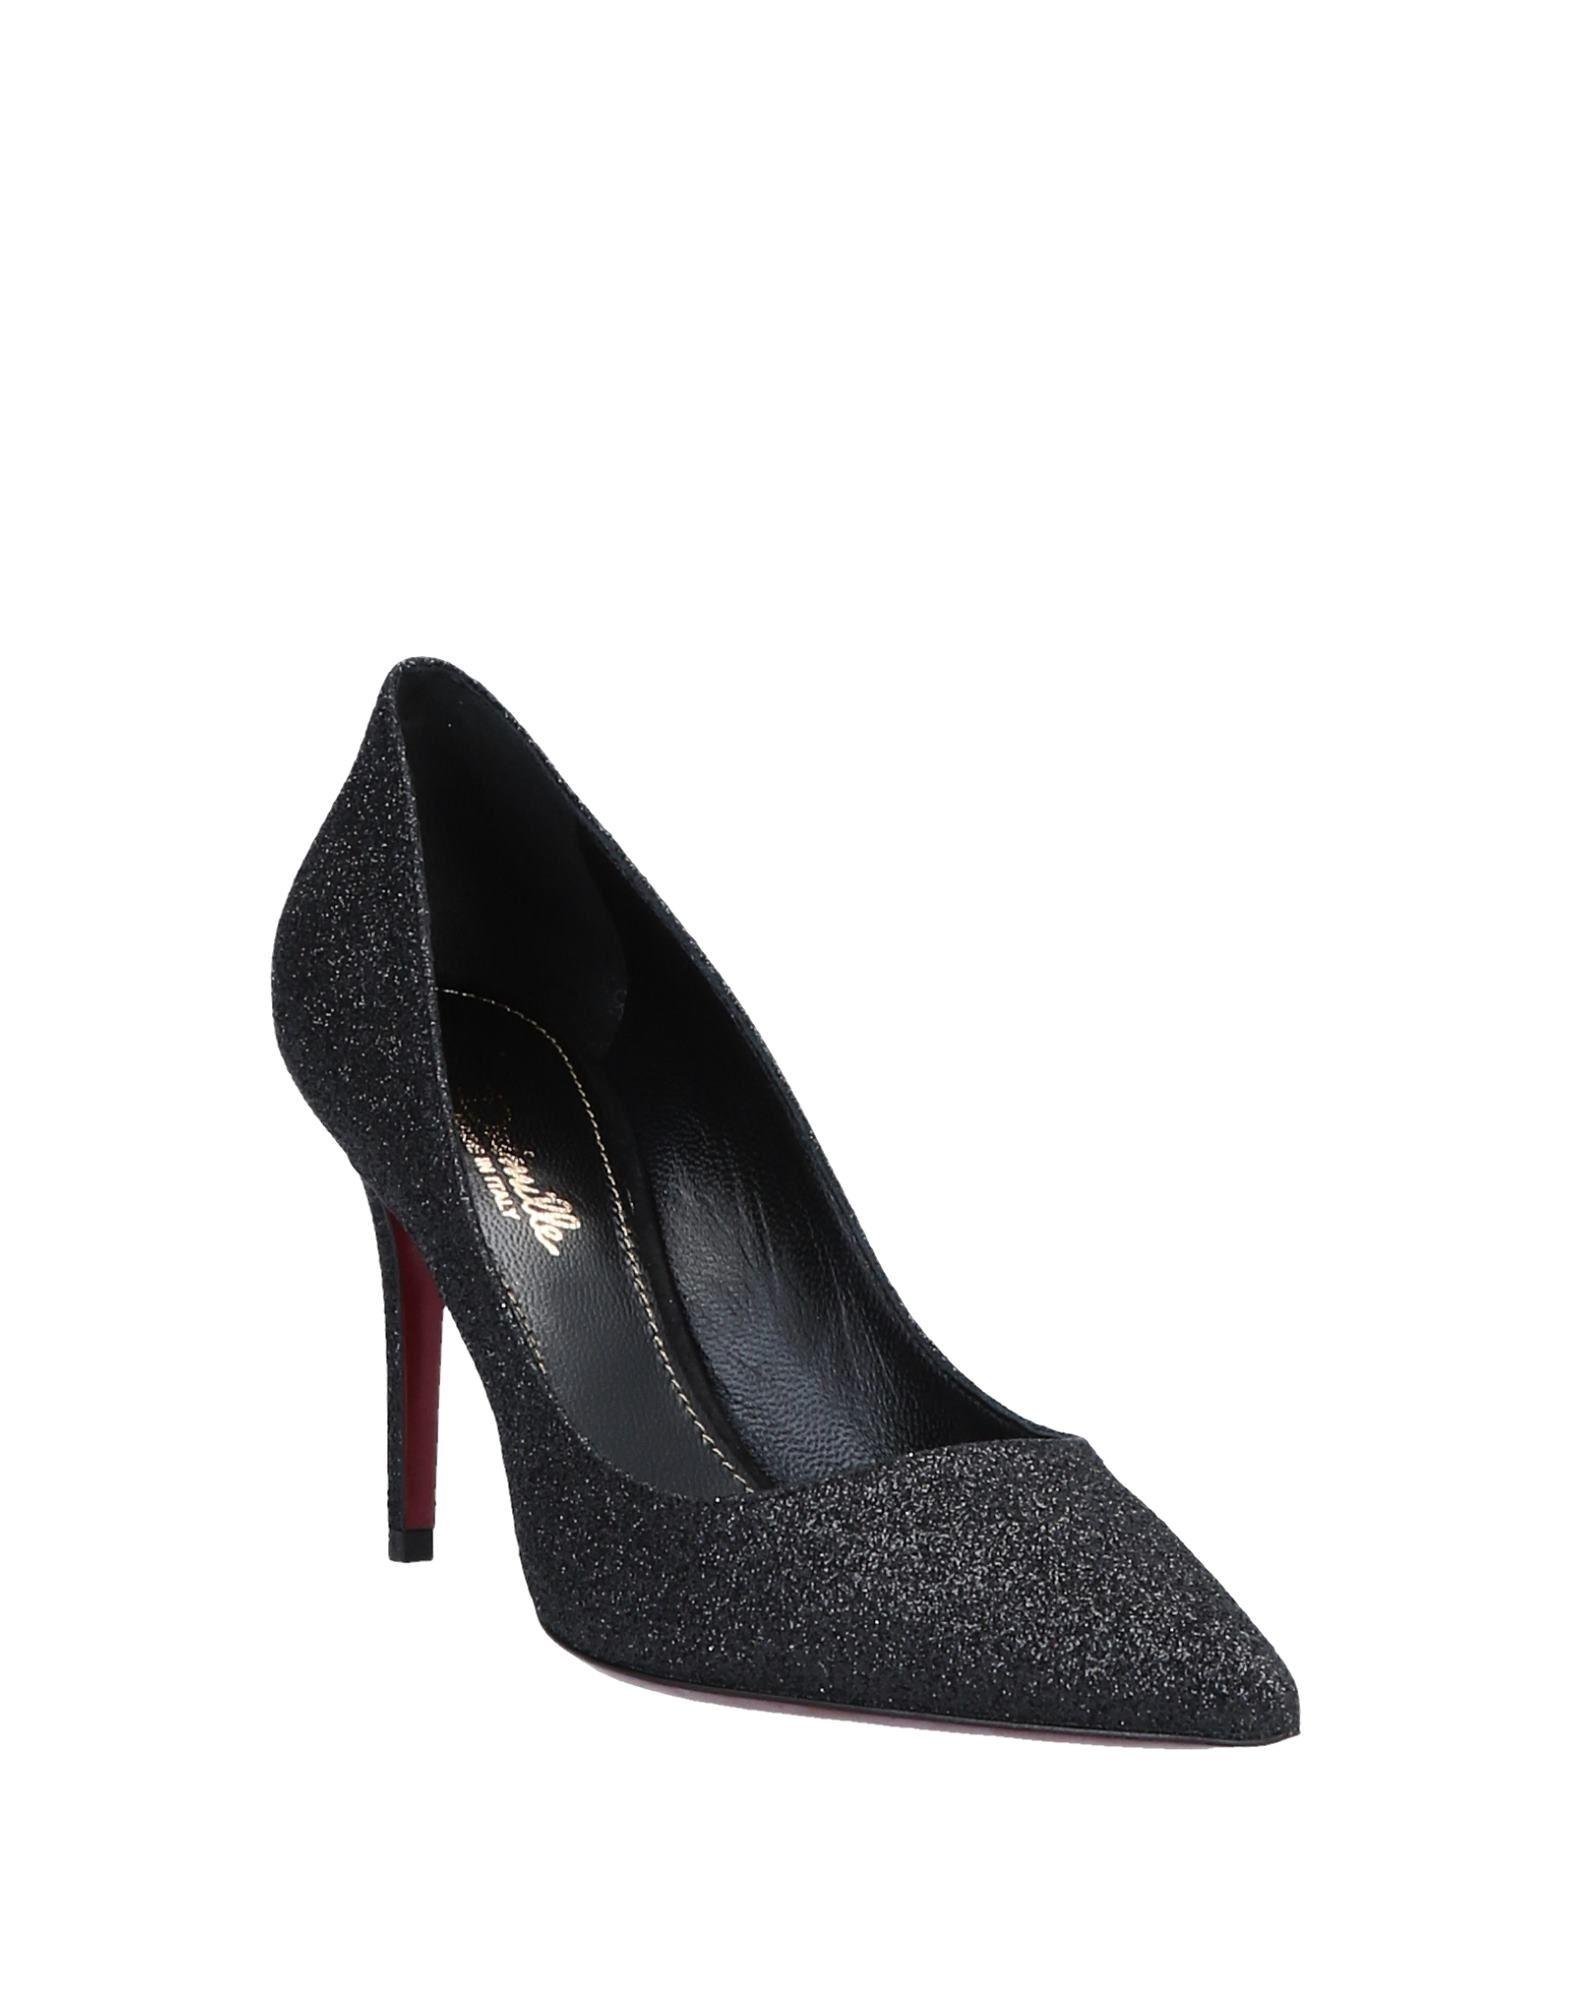 Deimille Pumps Damen Schuhe  11562153VVGut aussehende strapazierfähige Schuhe Damen 7c6018